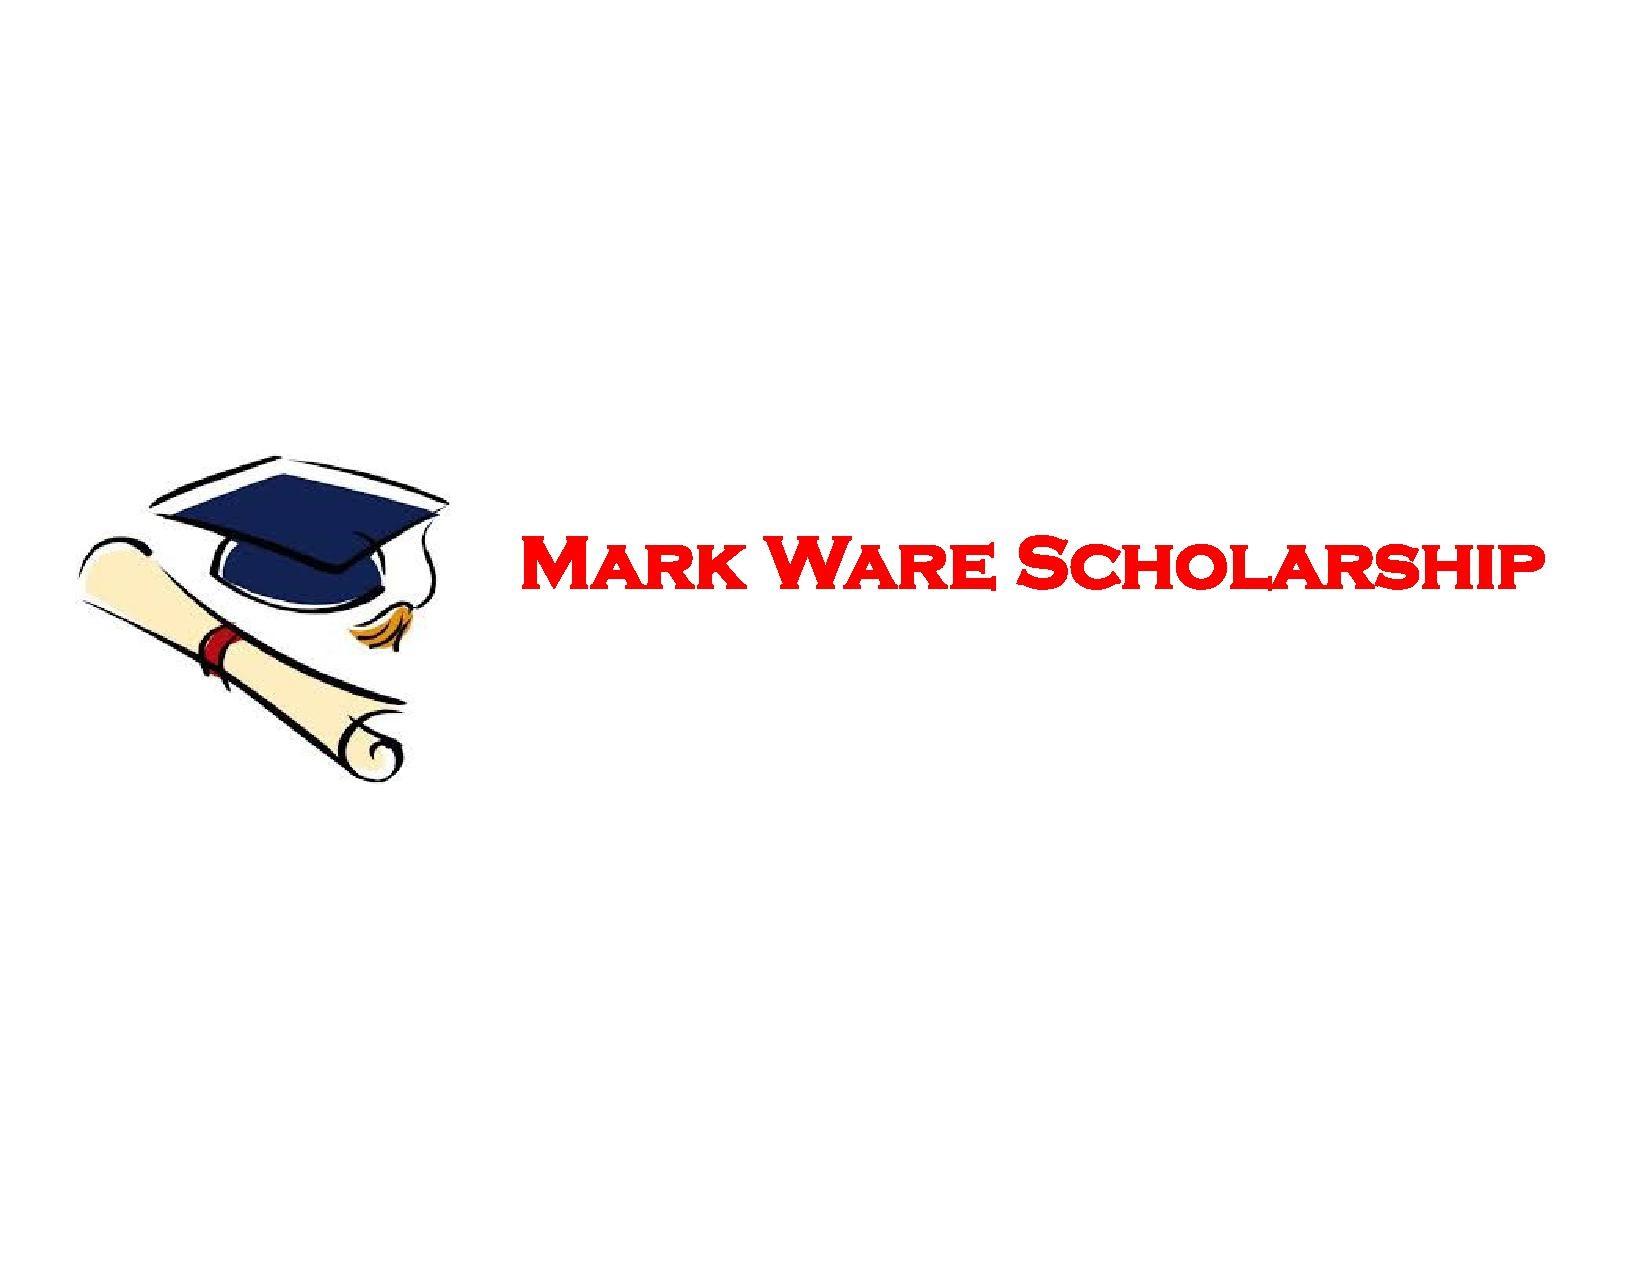 019 Essay Example Scholarship Prompts Wv Mark Ware Construction Magnificent Robertson 2018-19 Vanderbilt Washington And Lee Johnson Full